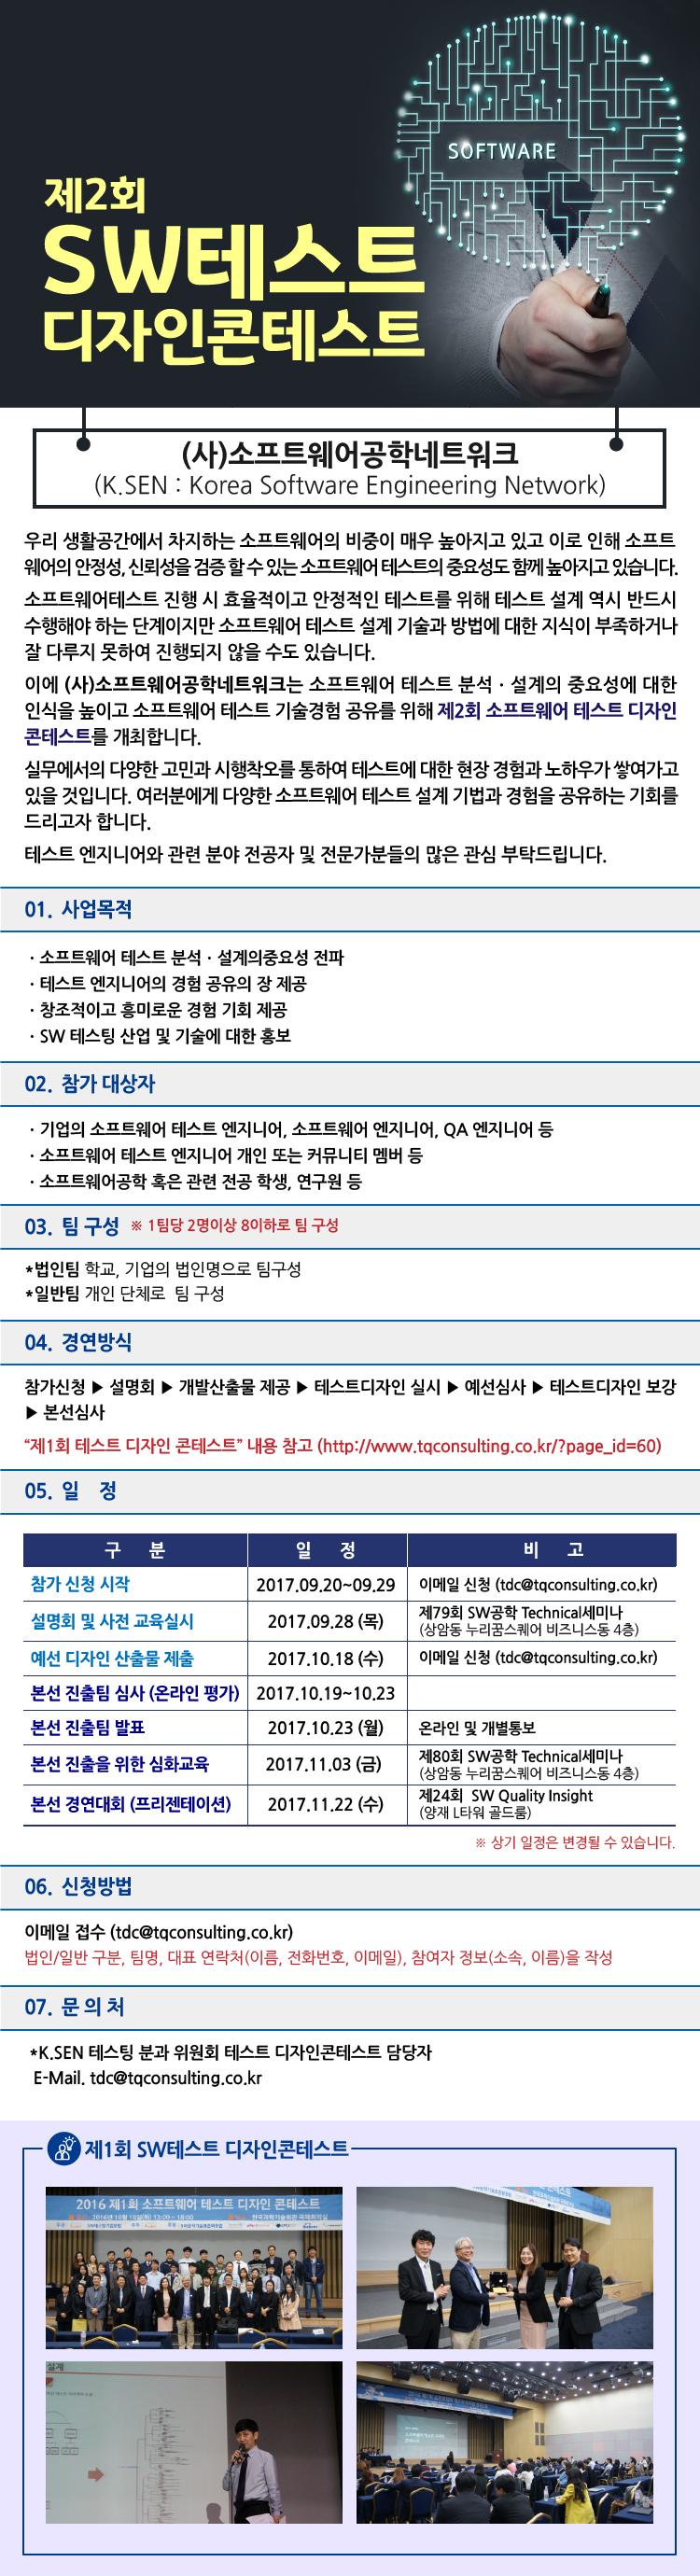 contest_info